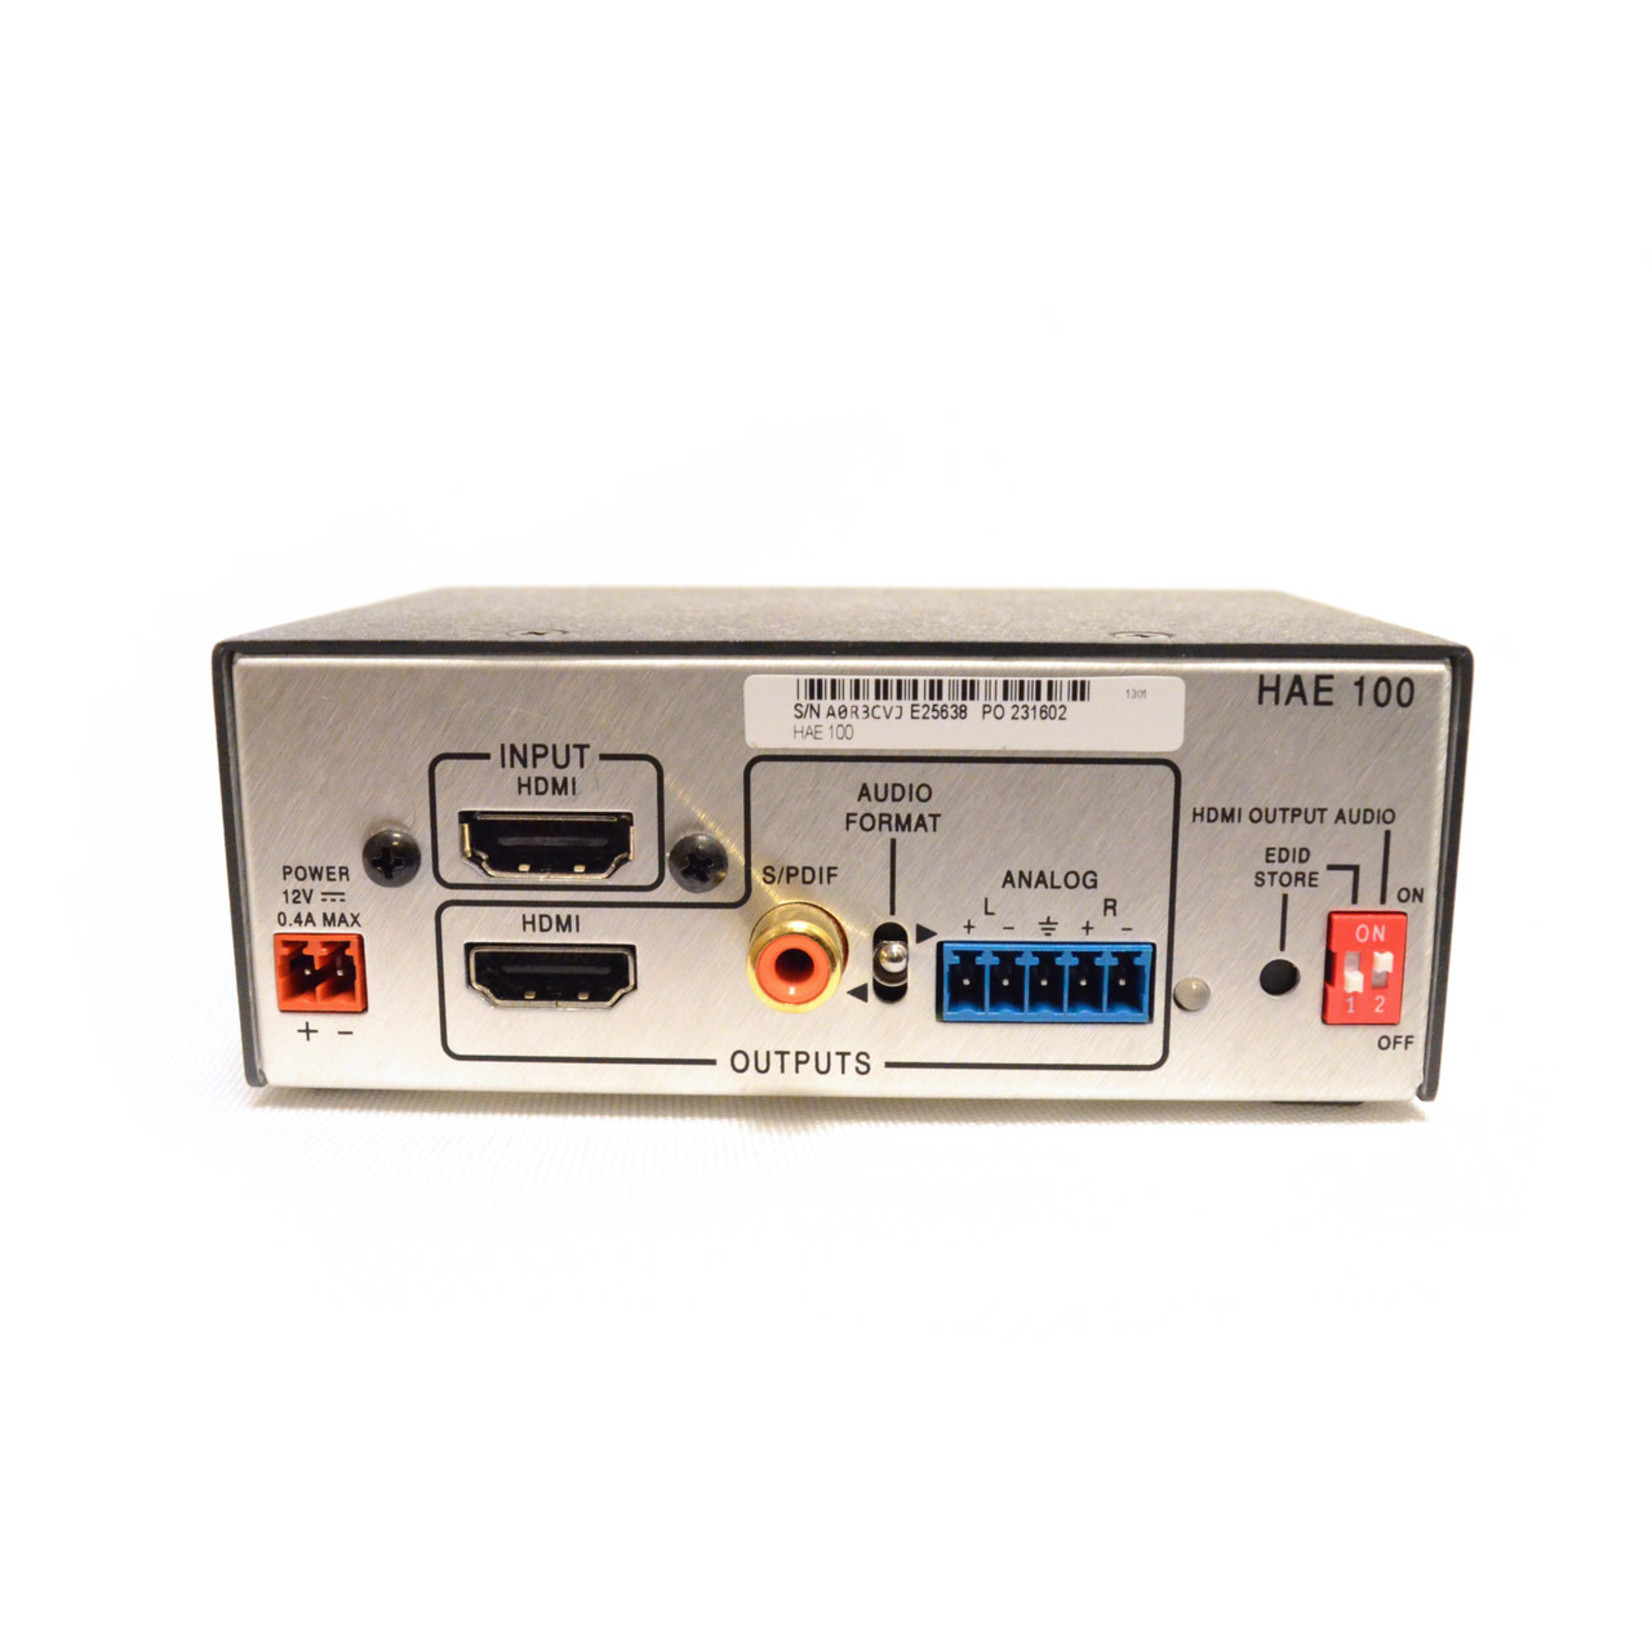 Extron HAE 100 Audio De-Embedder